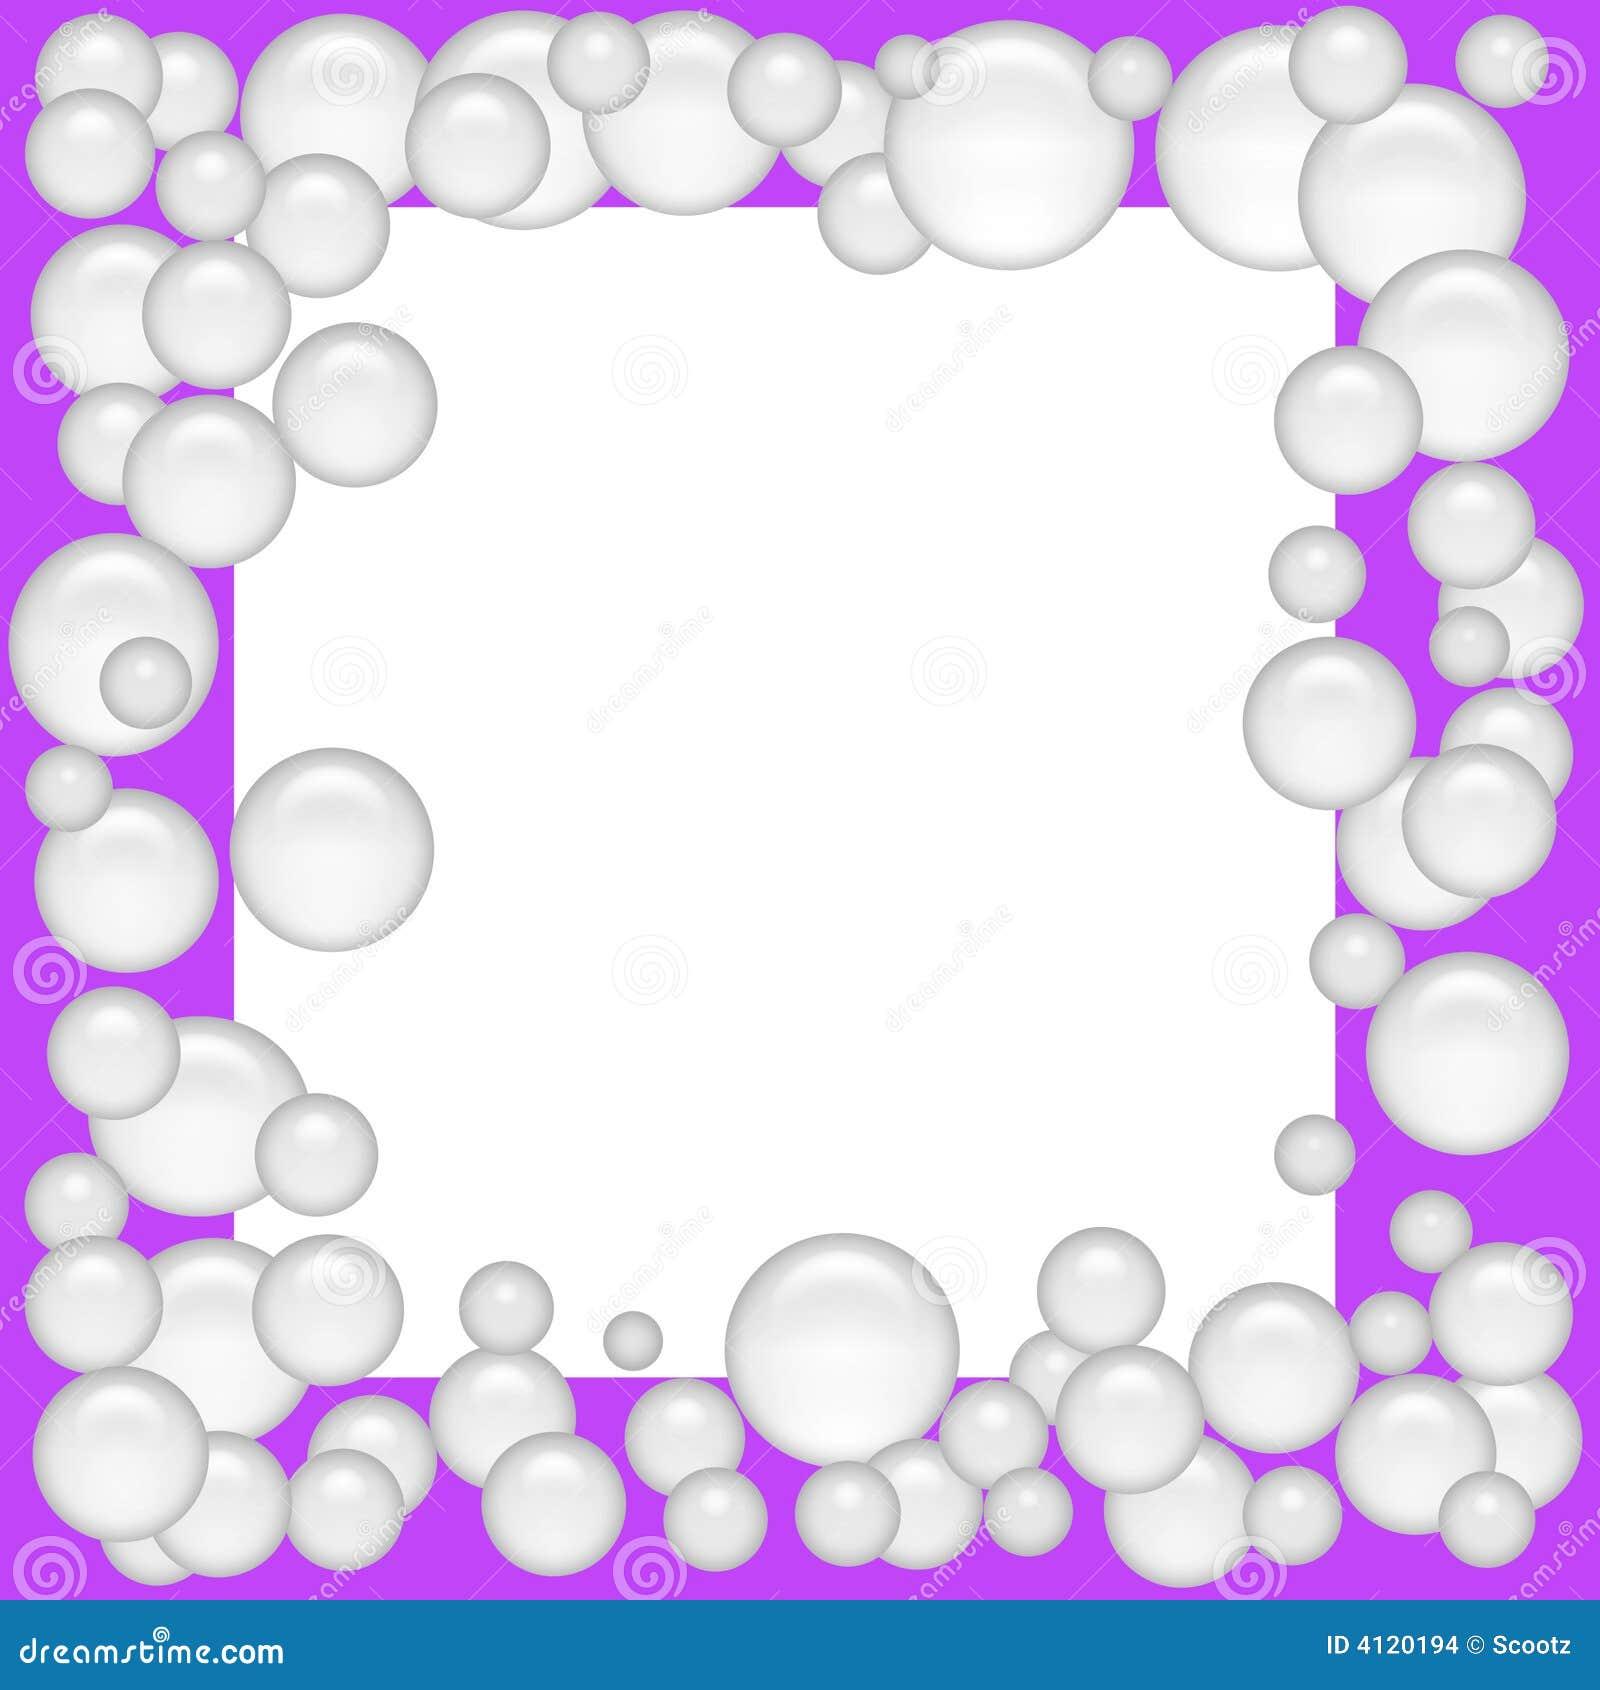 soap bubble frame stock illustration illustration of page 4120194